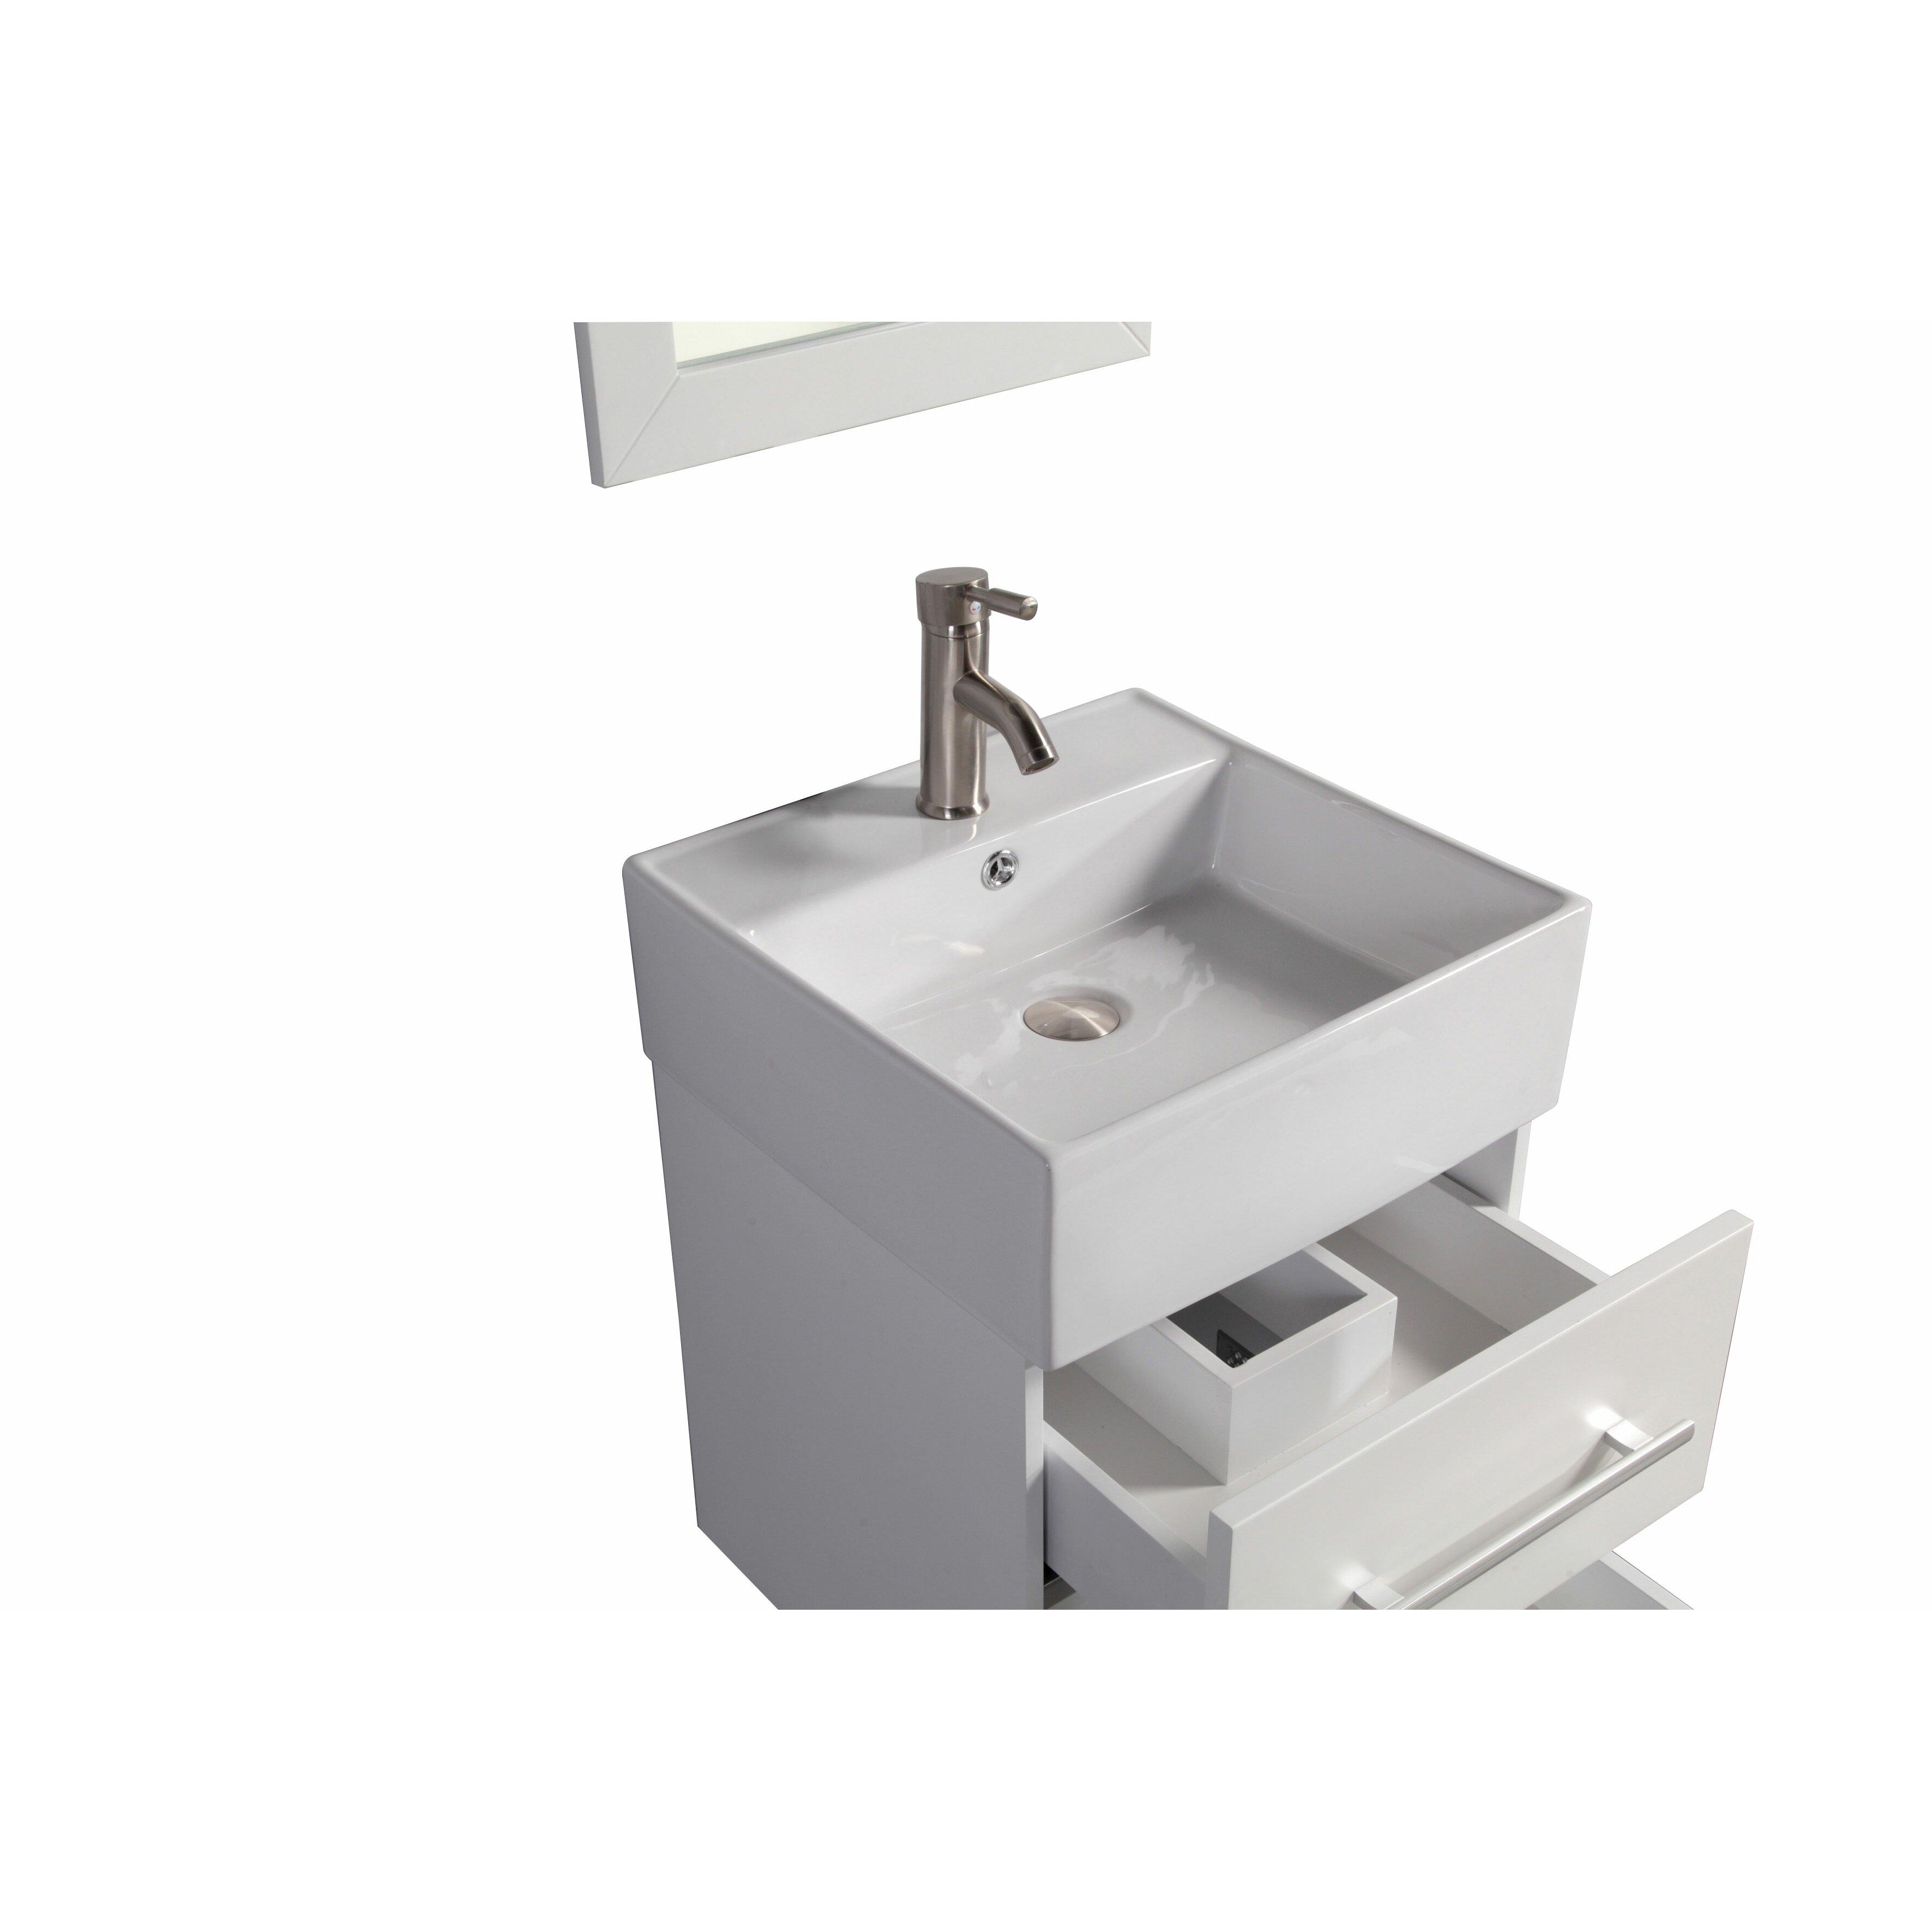 Nepal 18 single sink wall mounted bathroom vanity set with mirror wayfair for Bathroom wall mounted vanity mirrors